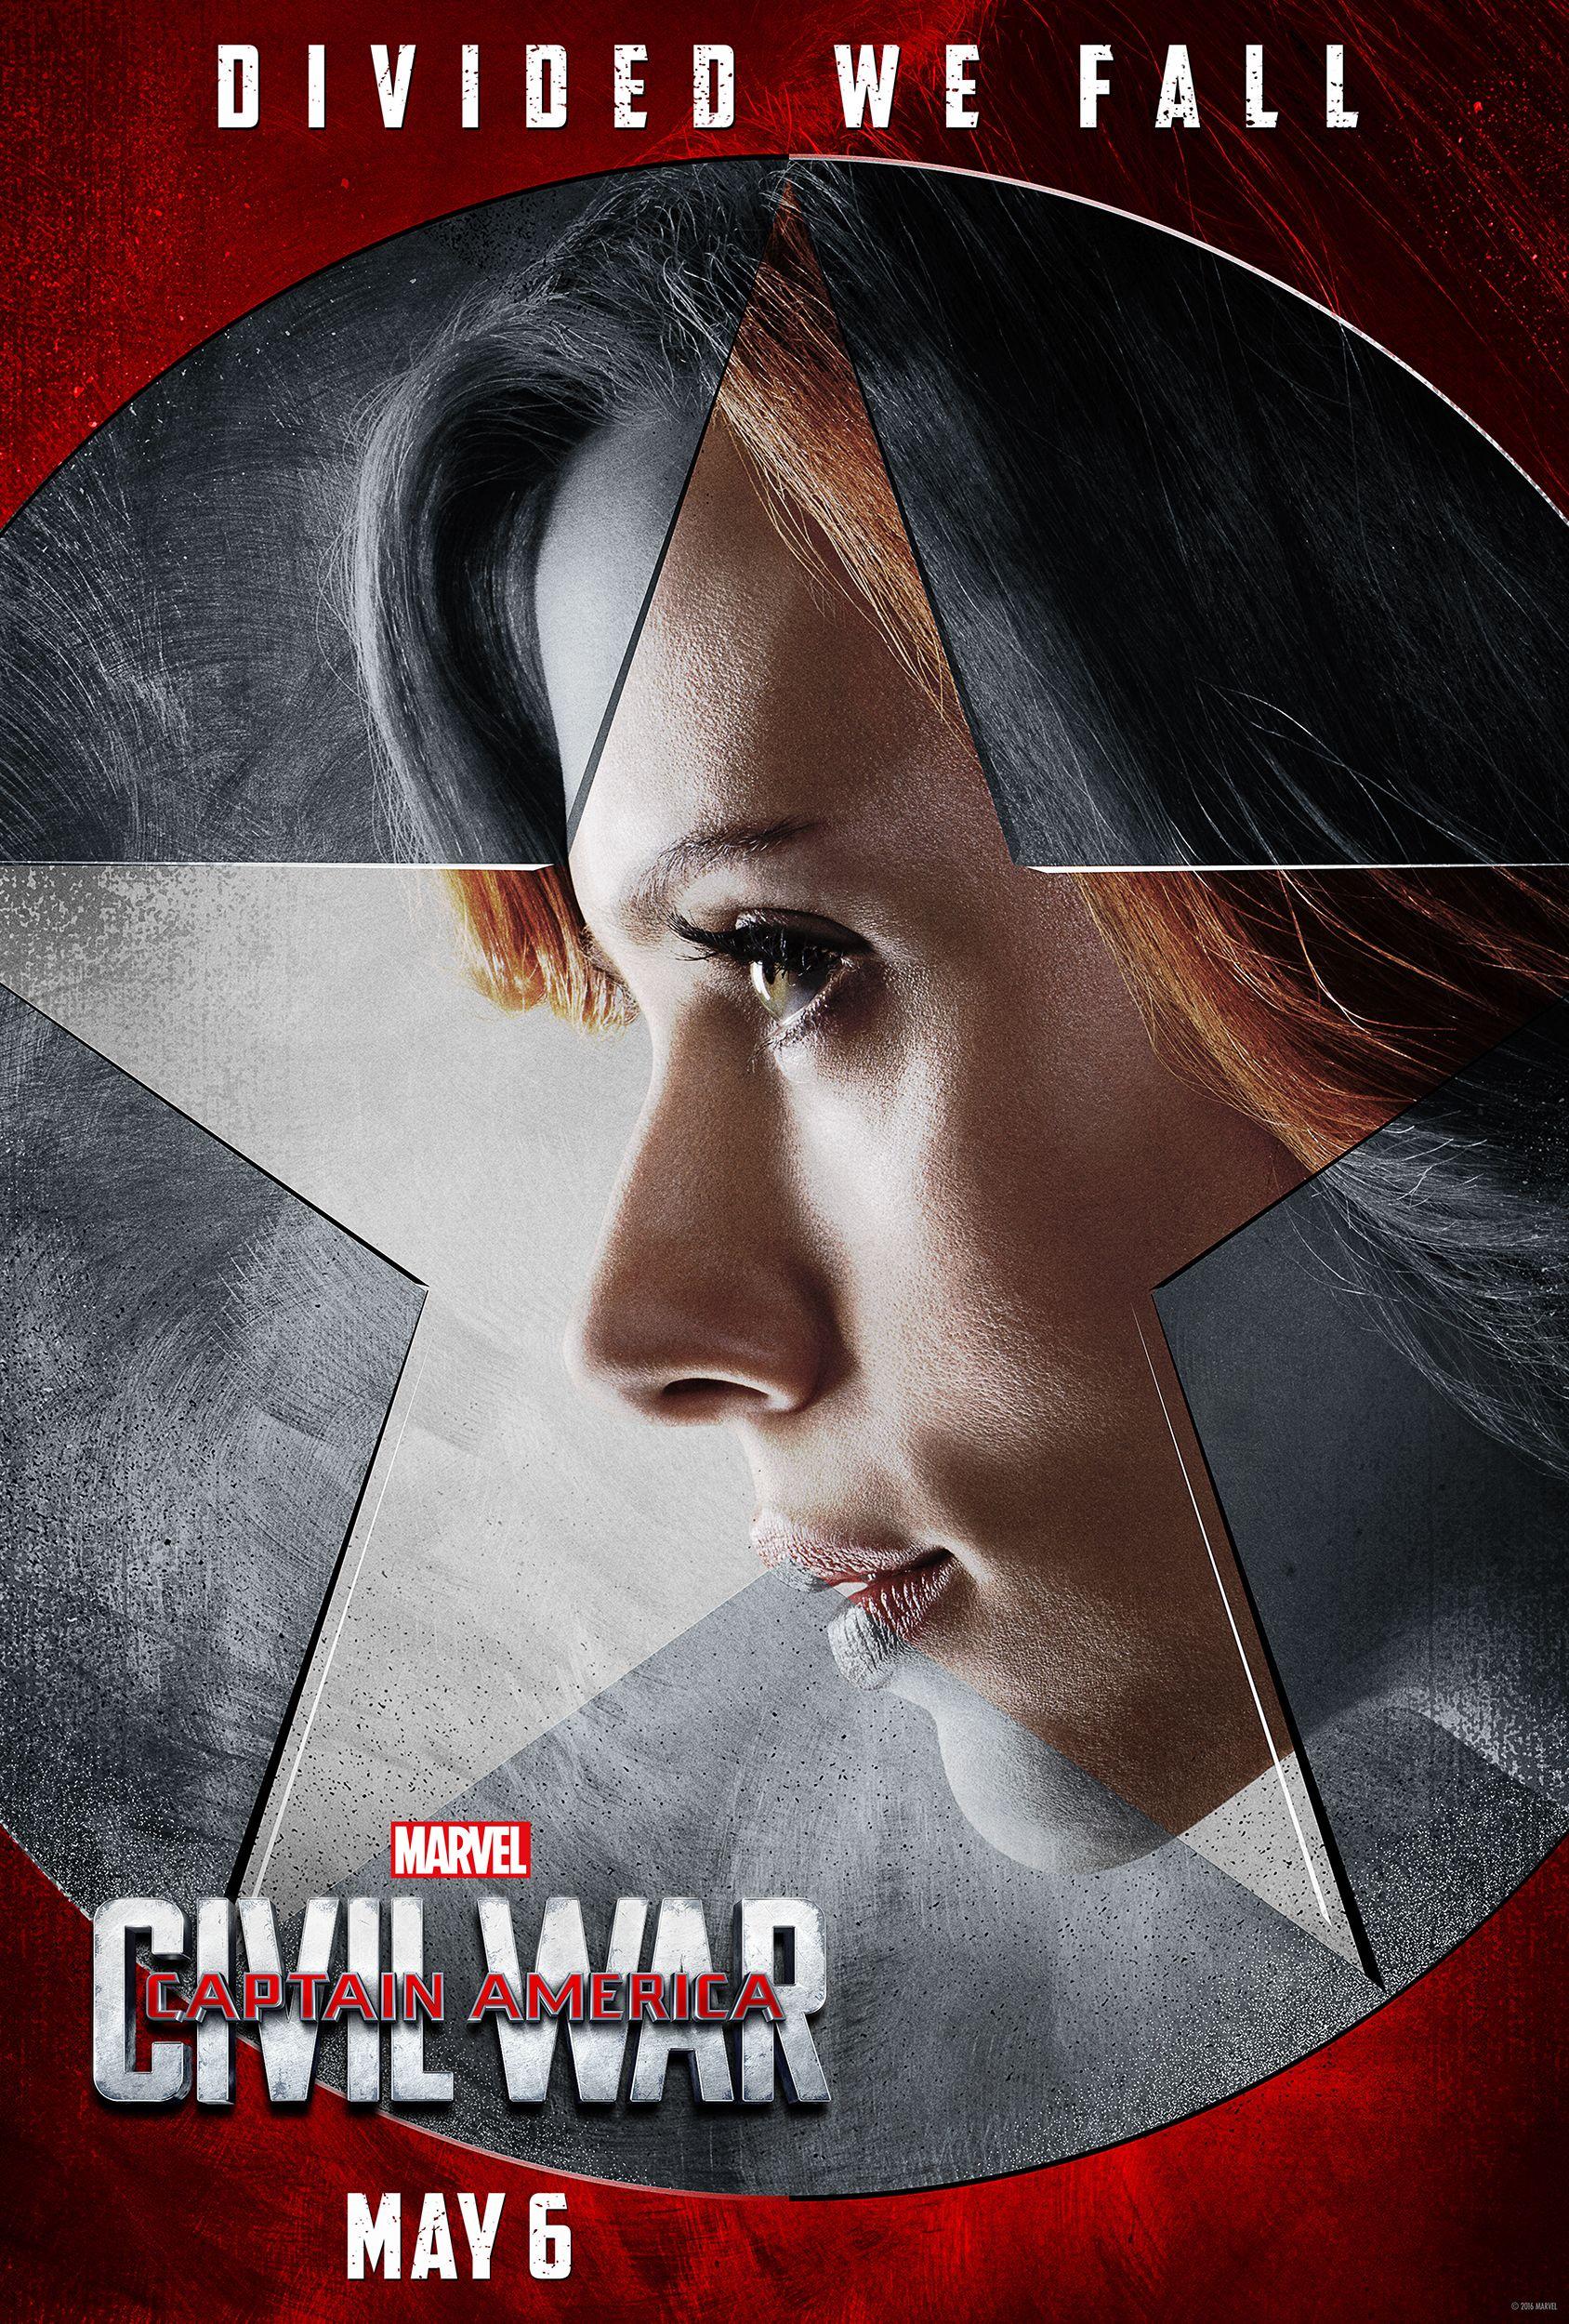 Captain America Civil War Posters For Team Iron Man Collider